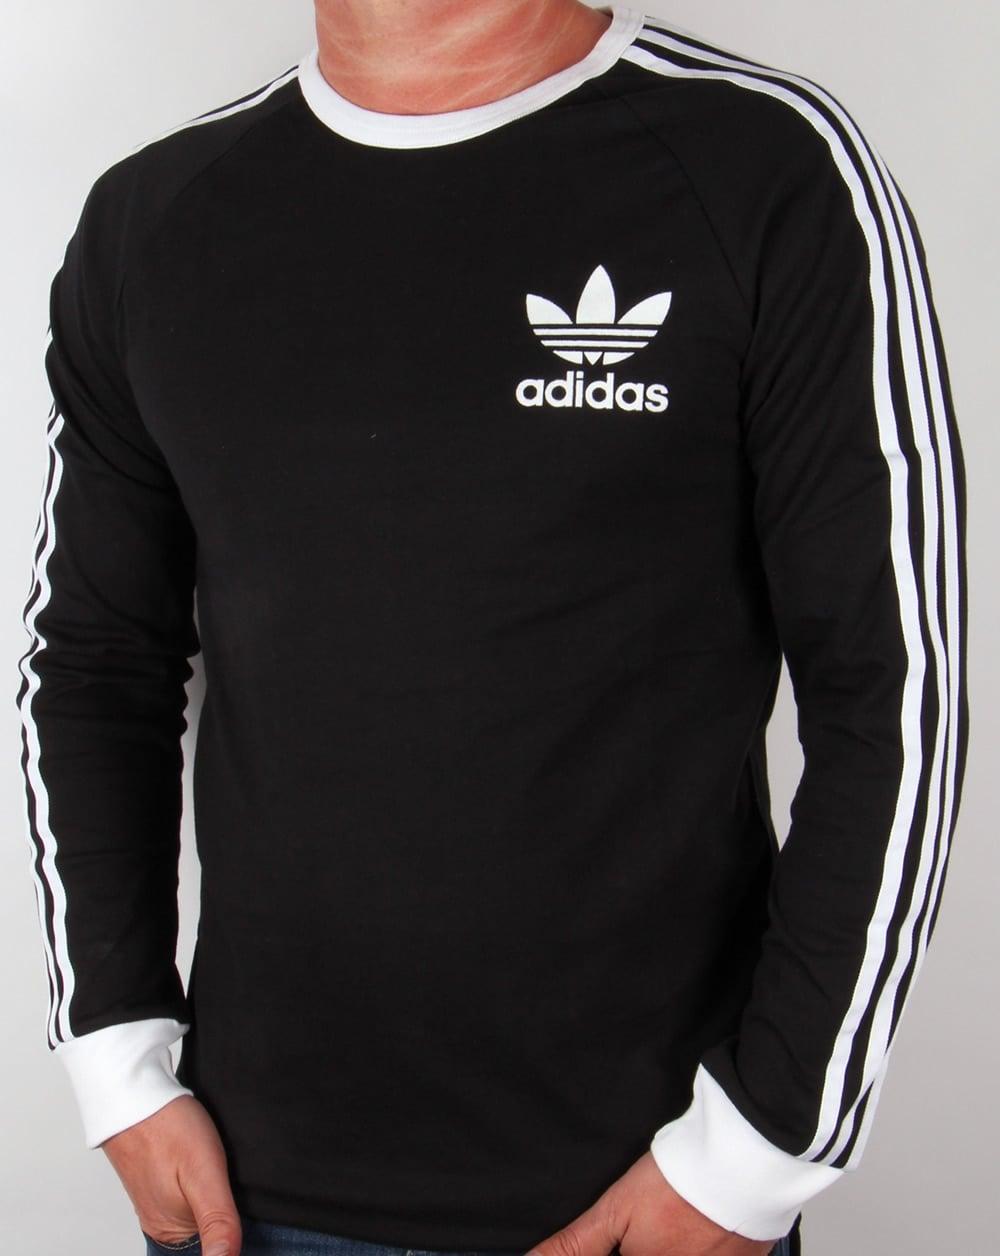 home t shirts adidas originals adidas originals 3 stripes. Black Bedroom Furniture Sets. Home Design Ideas